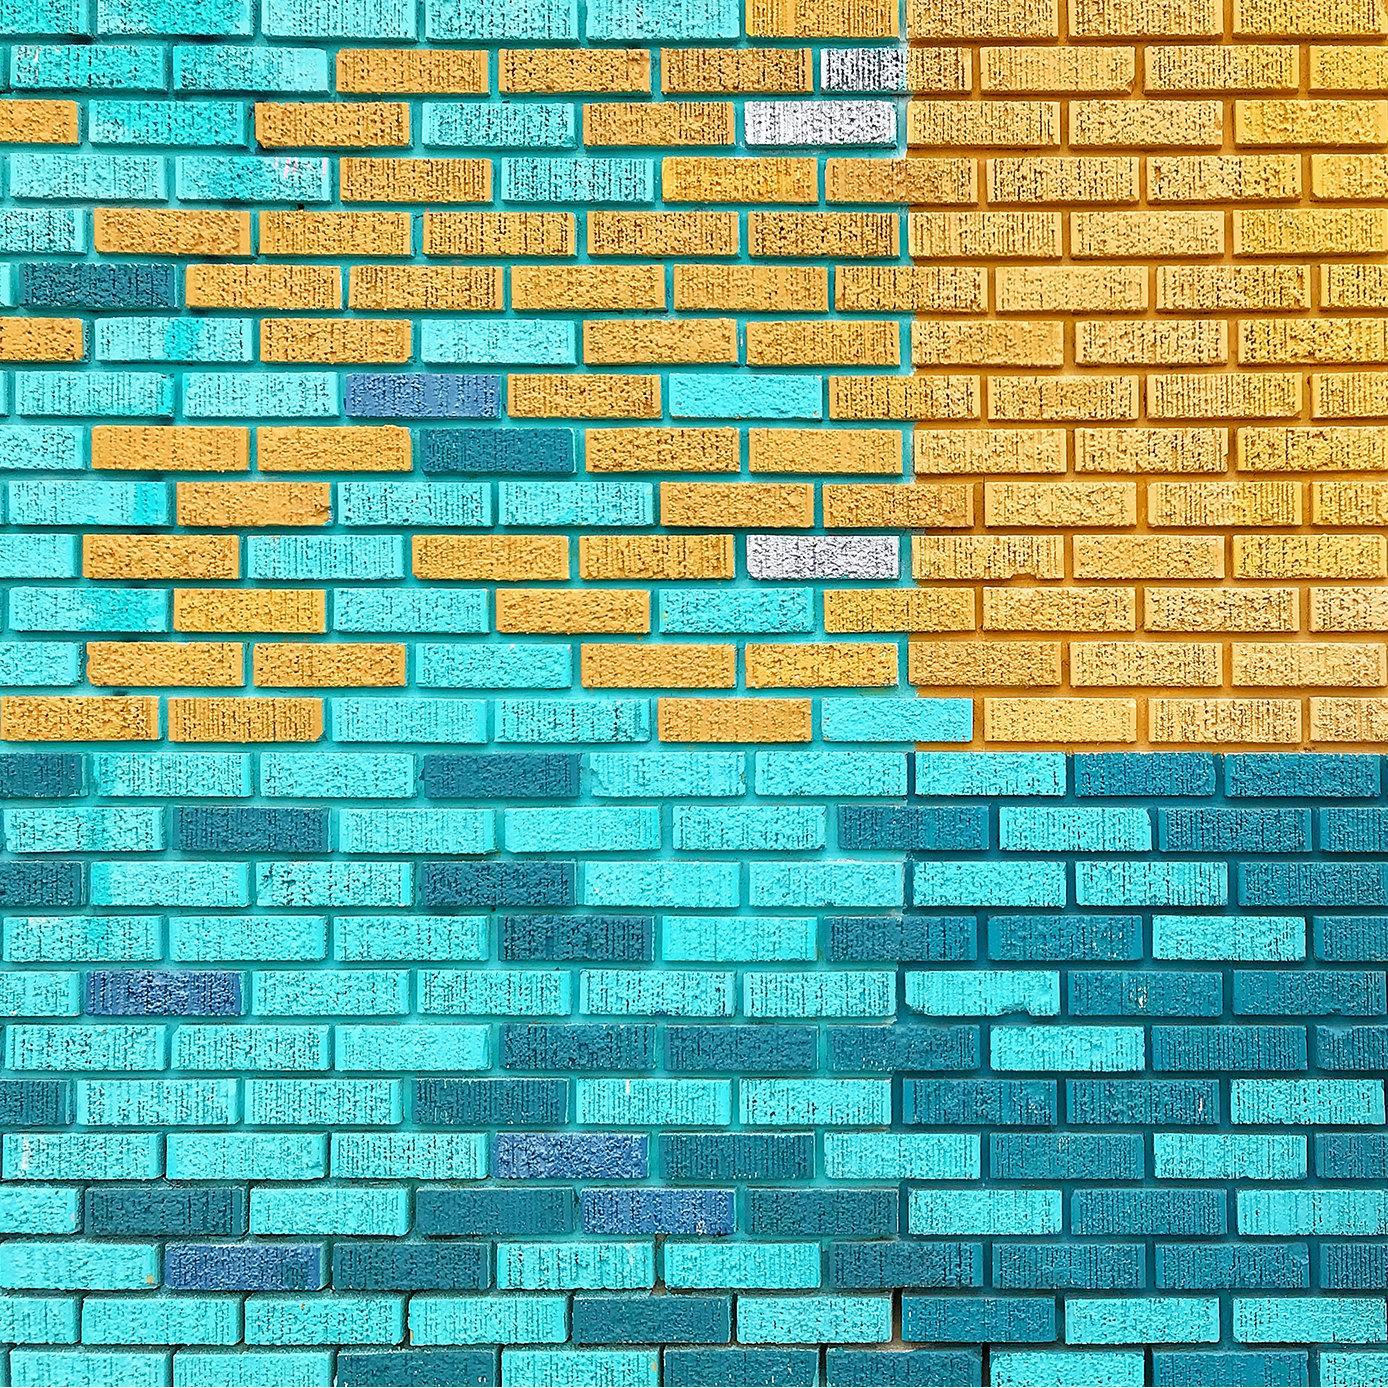 Los Angeles 12 Most Instagram Worthy Walls Fodors